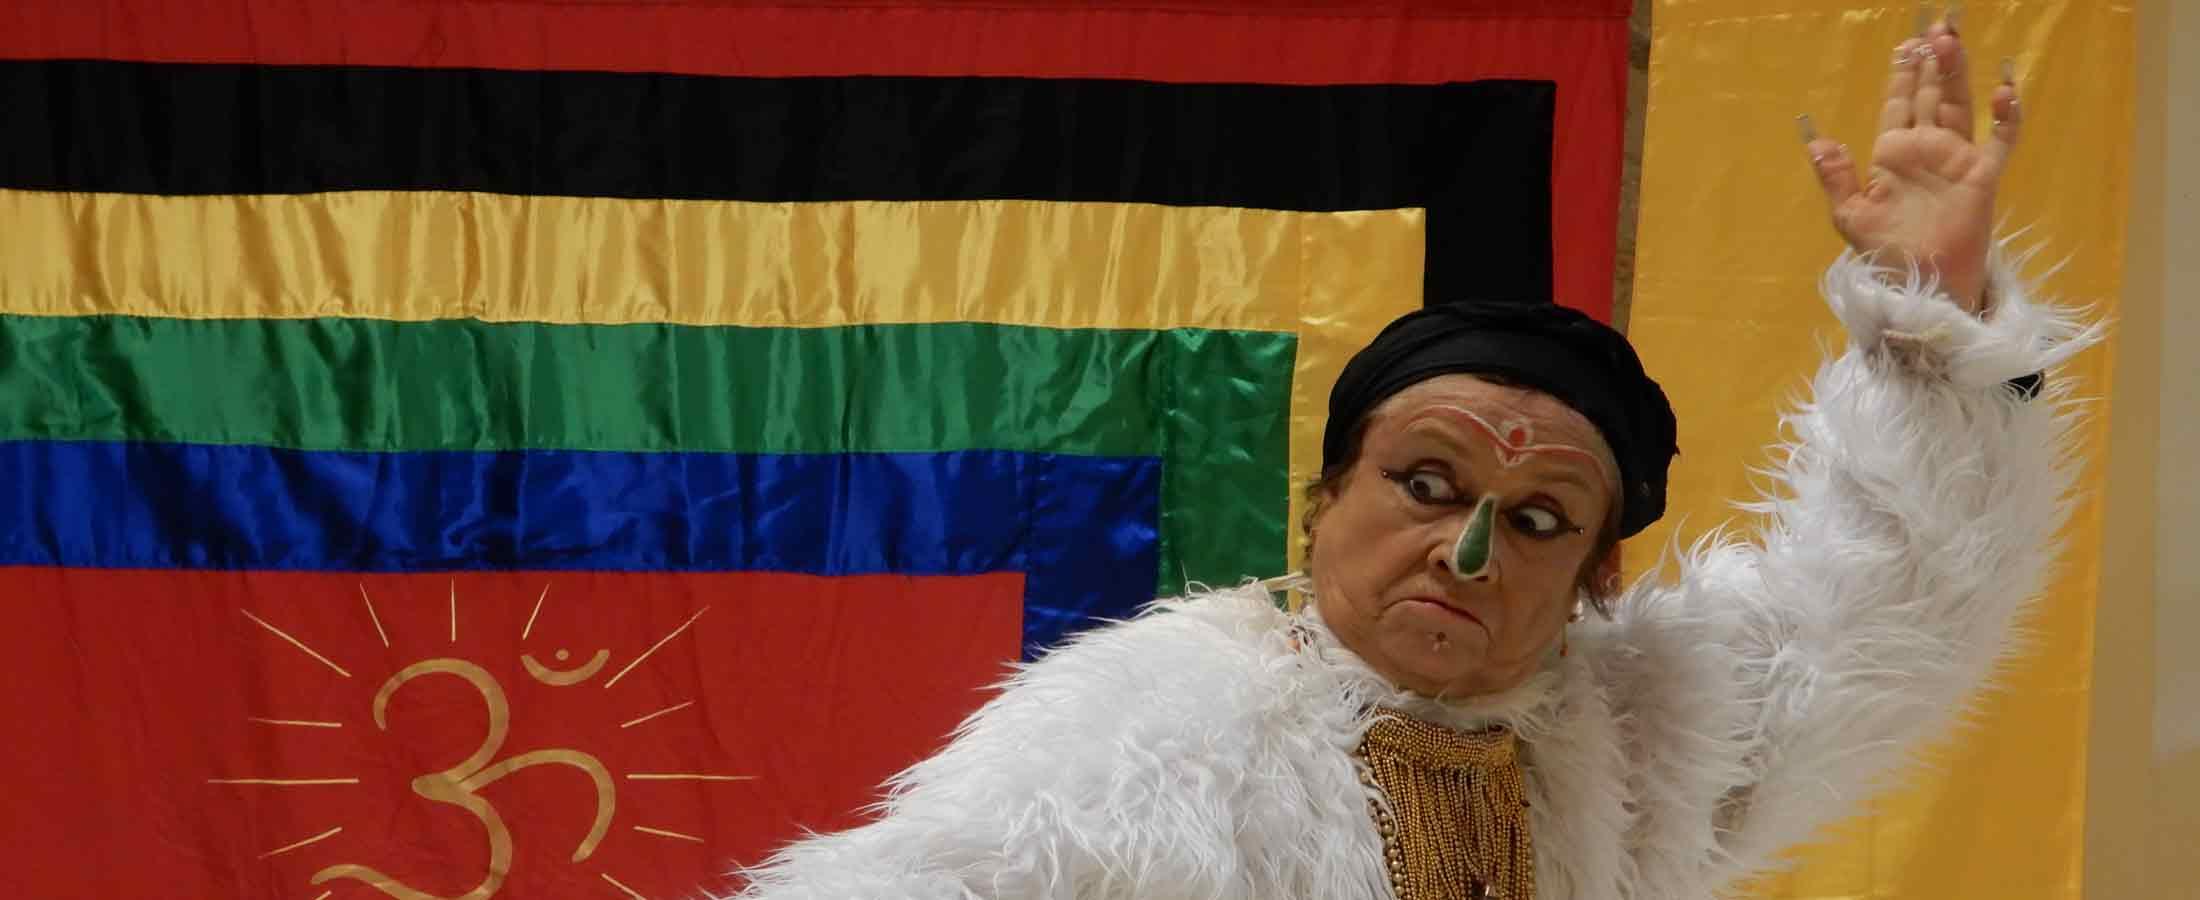 rencontre gay rive sud à Baie-Mahault